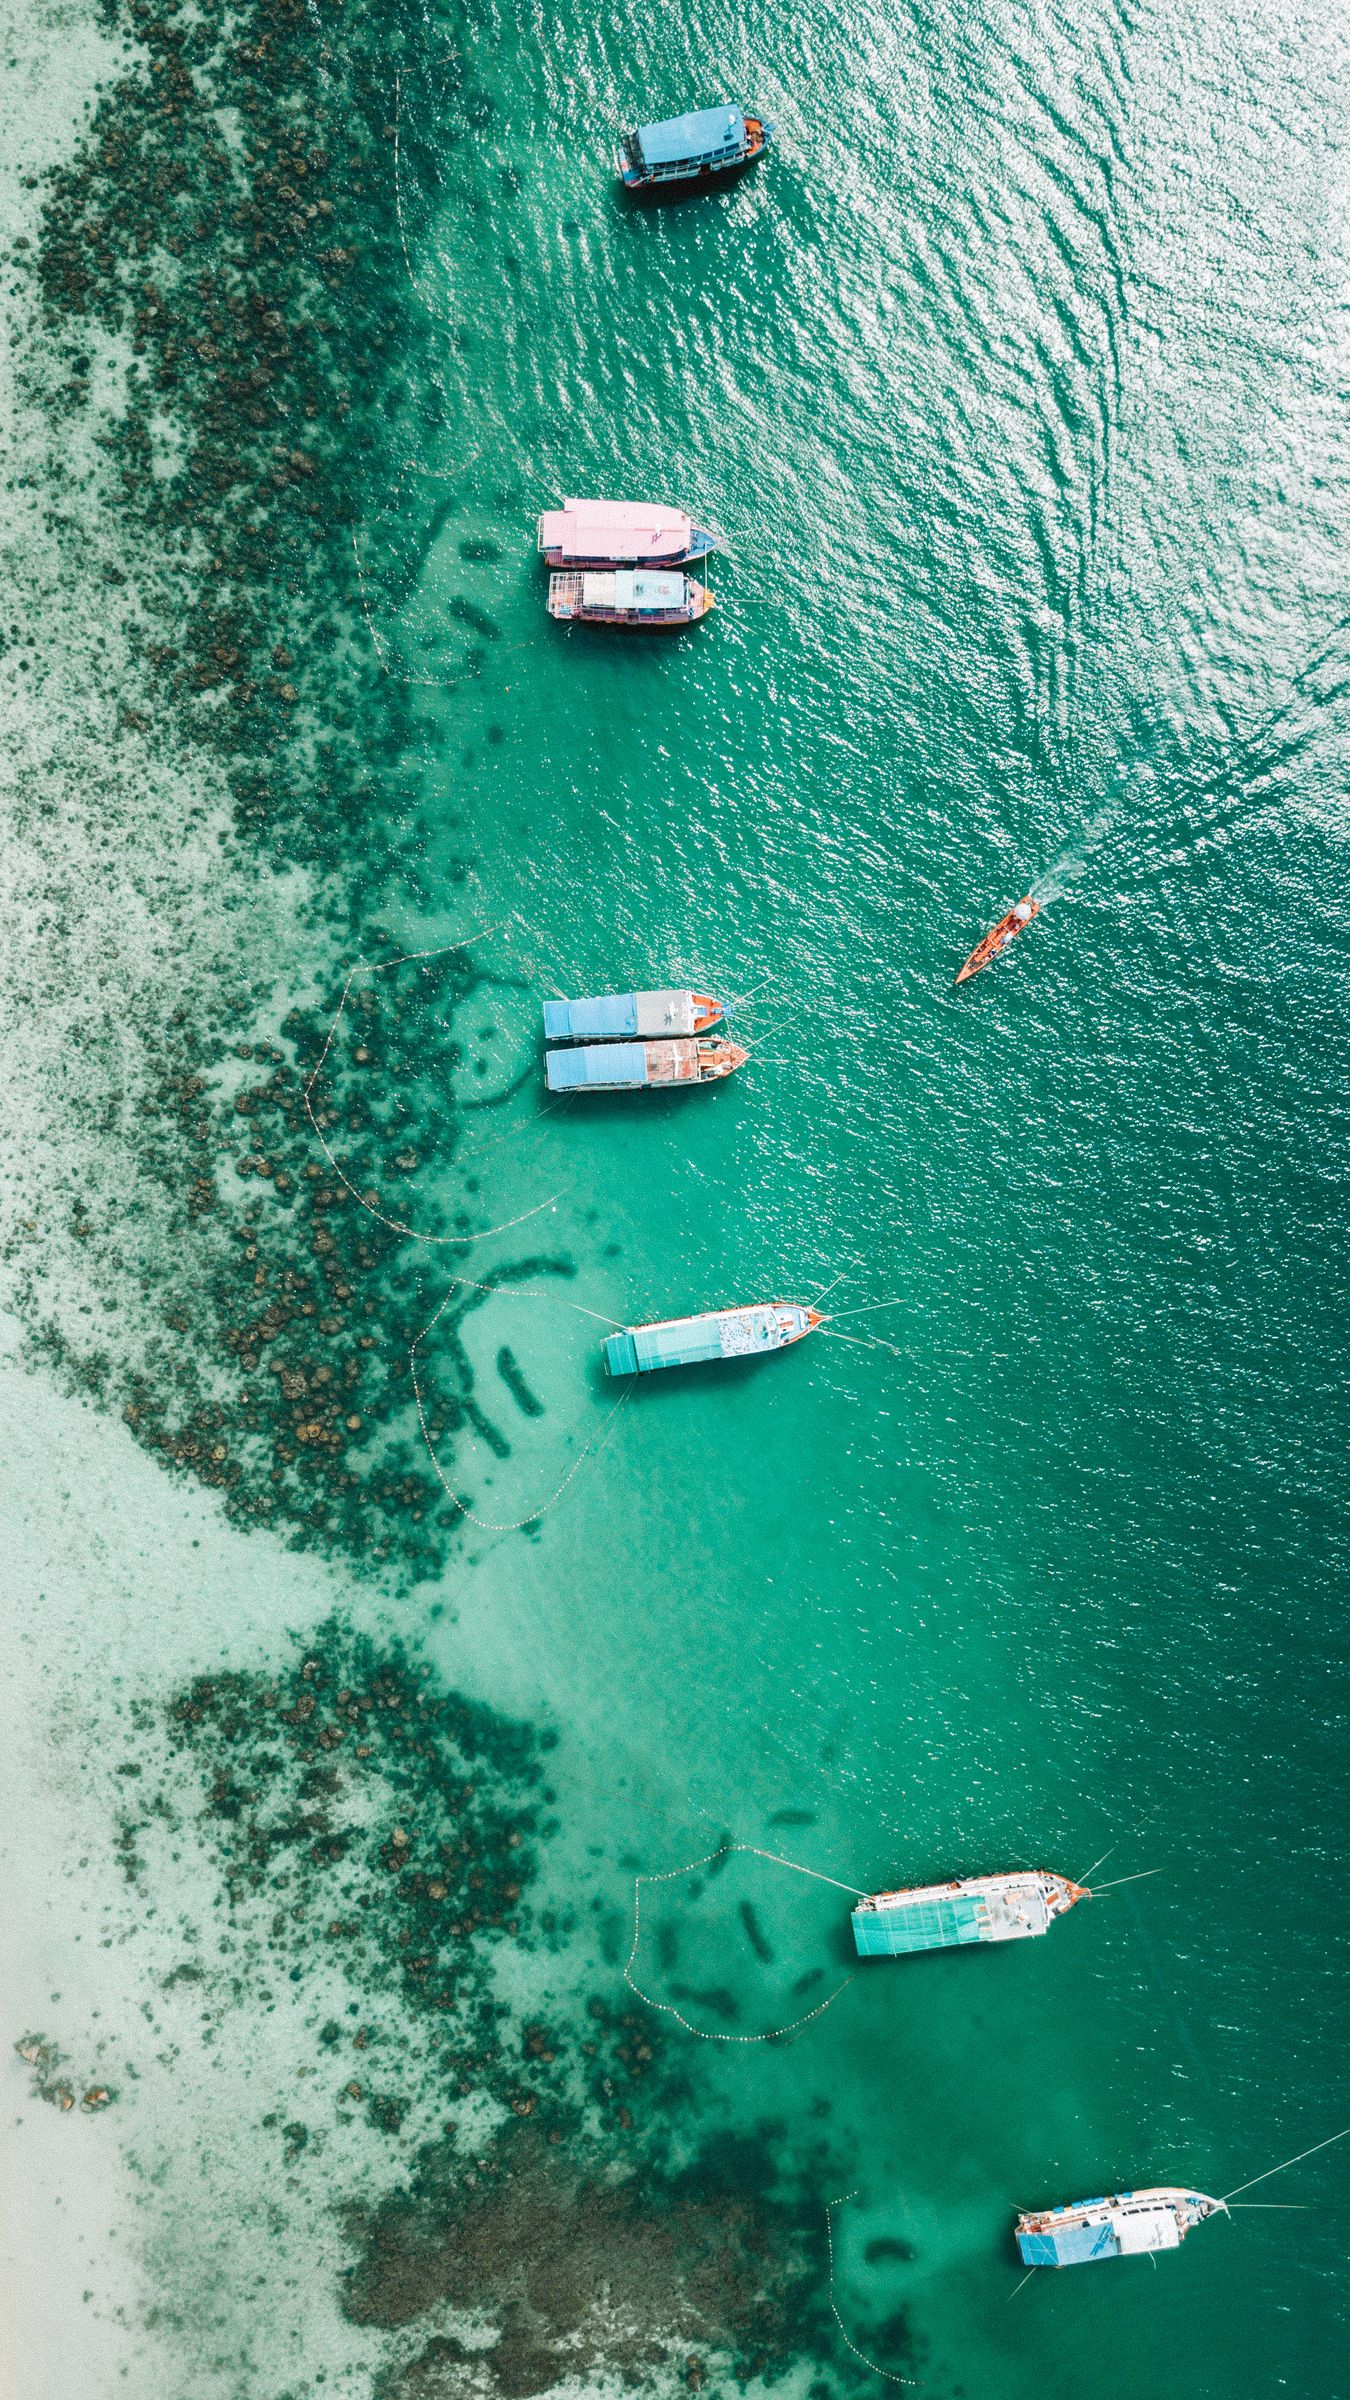 1350x2400 Wallpaper shore, boats, sandbar, ocean, moored, aerial view